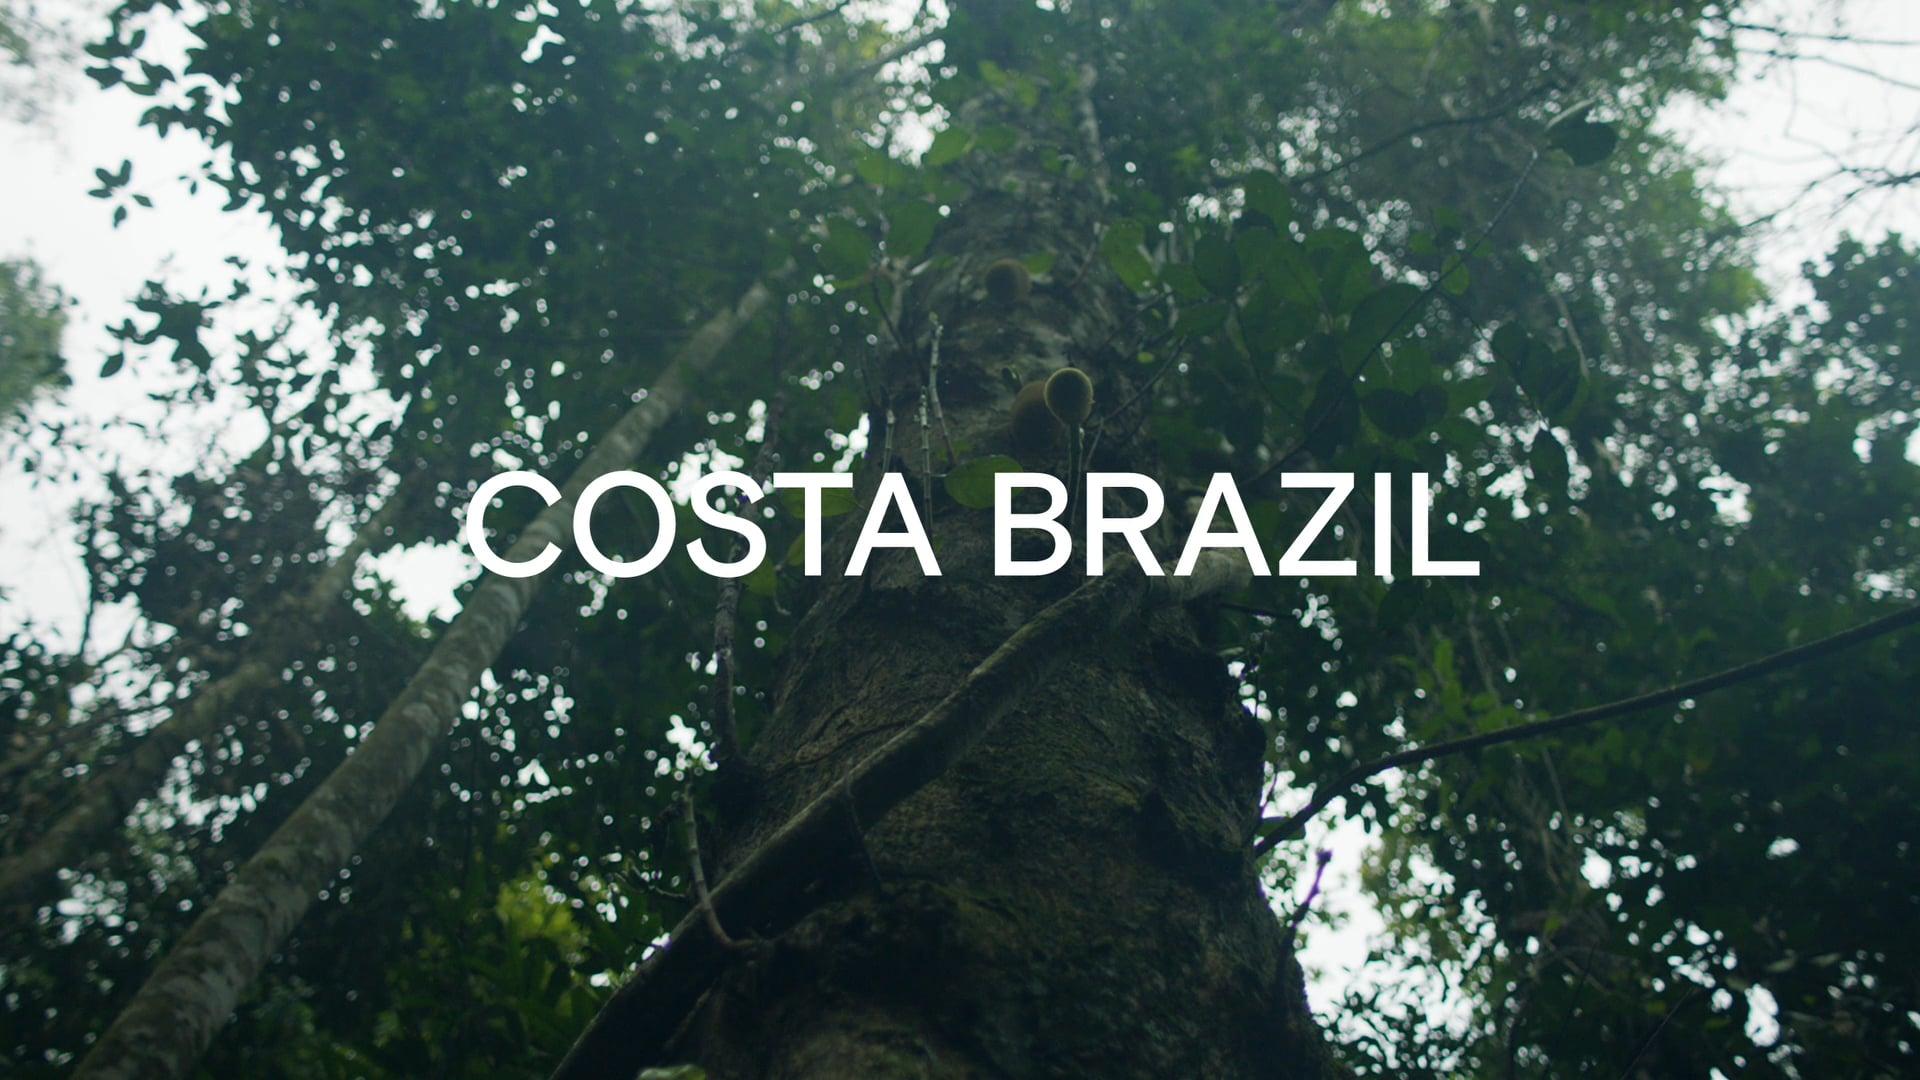 Costa Brazil | Jungle Oil